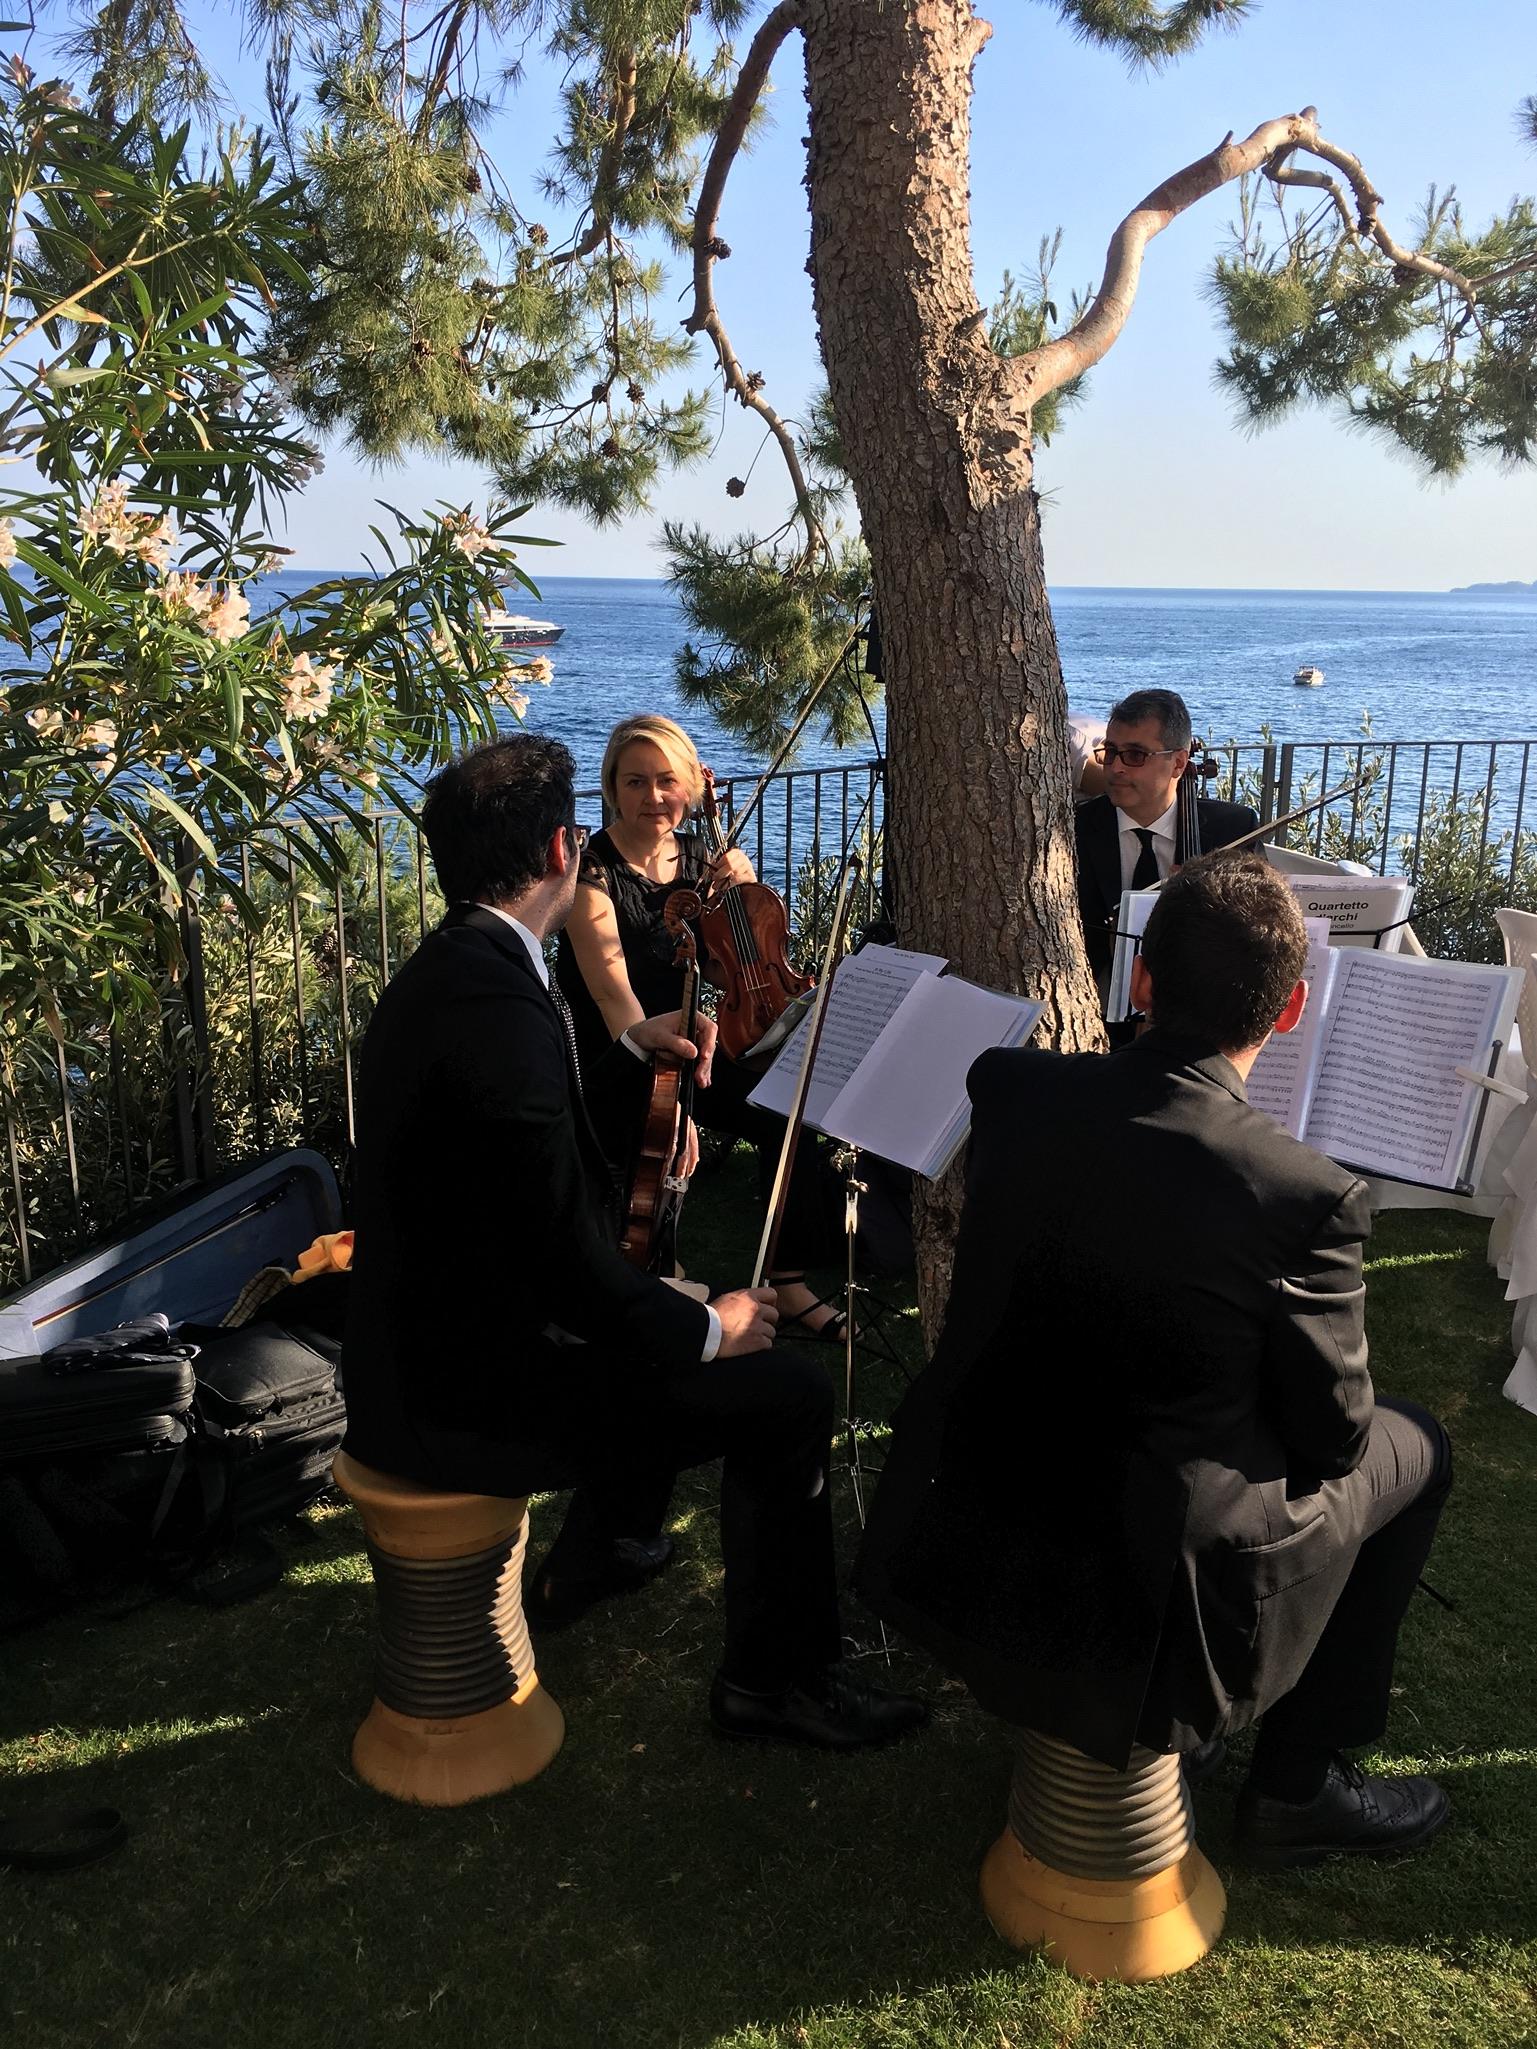 https://www.weddingamalfi.com/wp-content/uploads/Nathalie-and-Benjamin-wedding-in-Positano-14.jpg